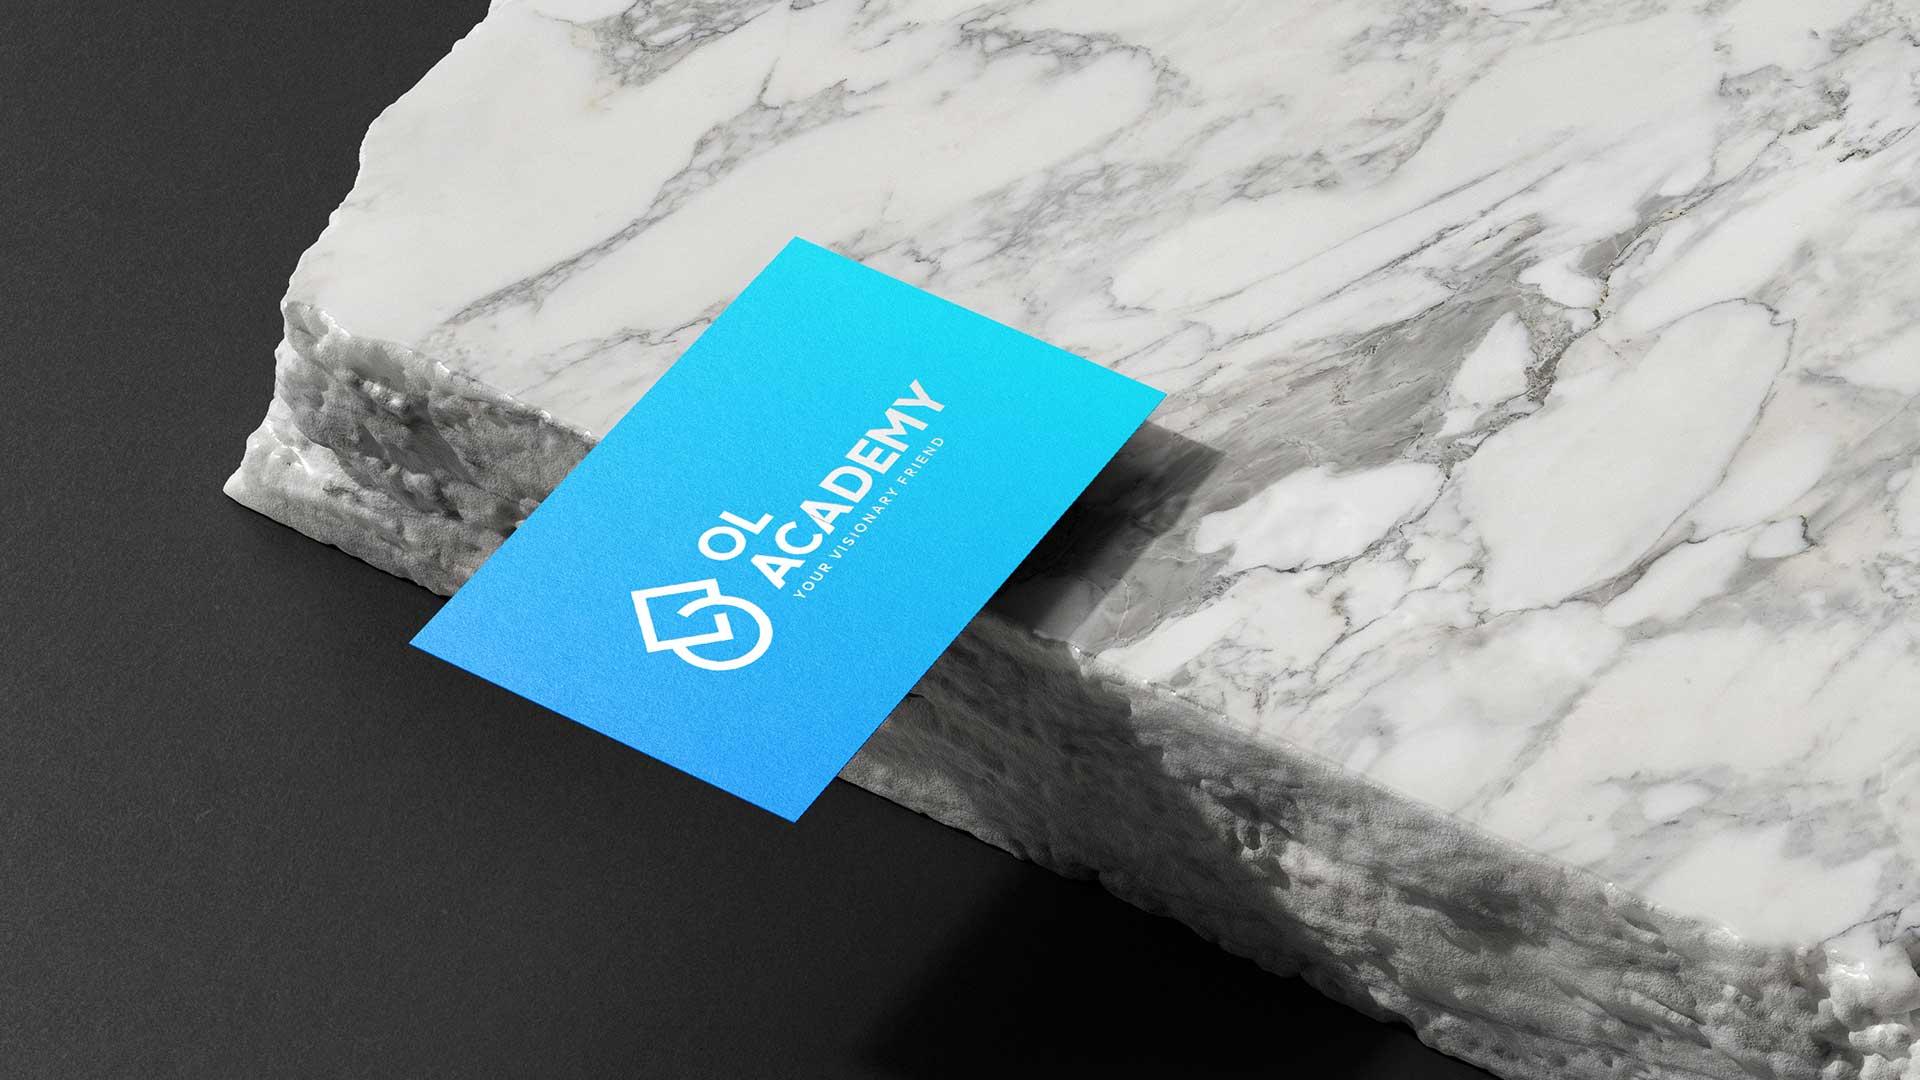 Brandit   OL Academy - ლოგოს დამზადება, ლოგოს დიზაინი, ლოგოების შექმნა, ლოგოების დამზადება, ლოგოს დამზადების ფასი, ბრენდინგი, ბანერების დამზადება, ლოგოტიპის შექმნა, ლოგოტიპების დიზაინი, ოპტიმიზაცია, facebook დიზაინი, ვებგვერდის დიზაინი, ლოგოების დიზაინი, ლოგოტიპების დამზადება, saitebis damzadena, logoebis damzadeba, saitis damzadeba, logos damzadeba,